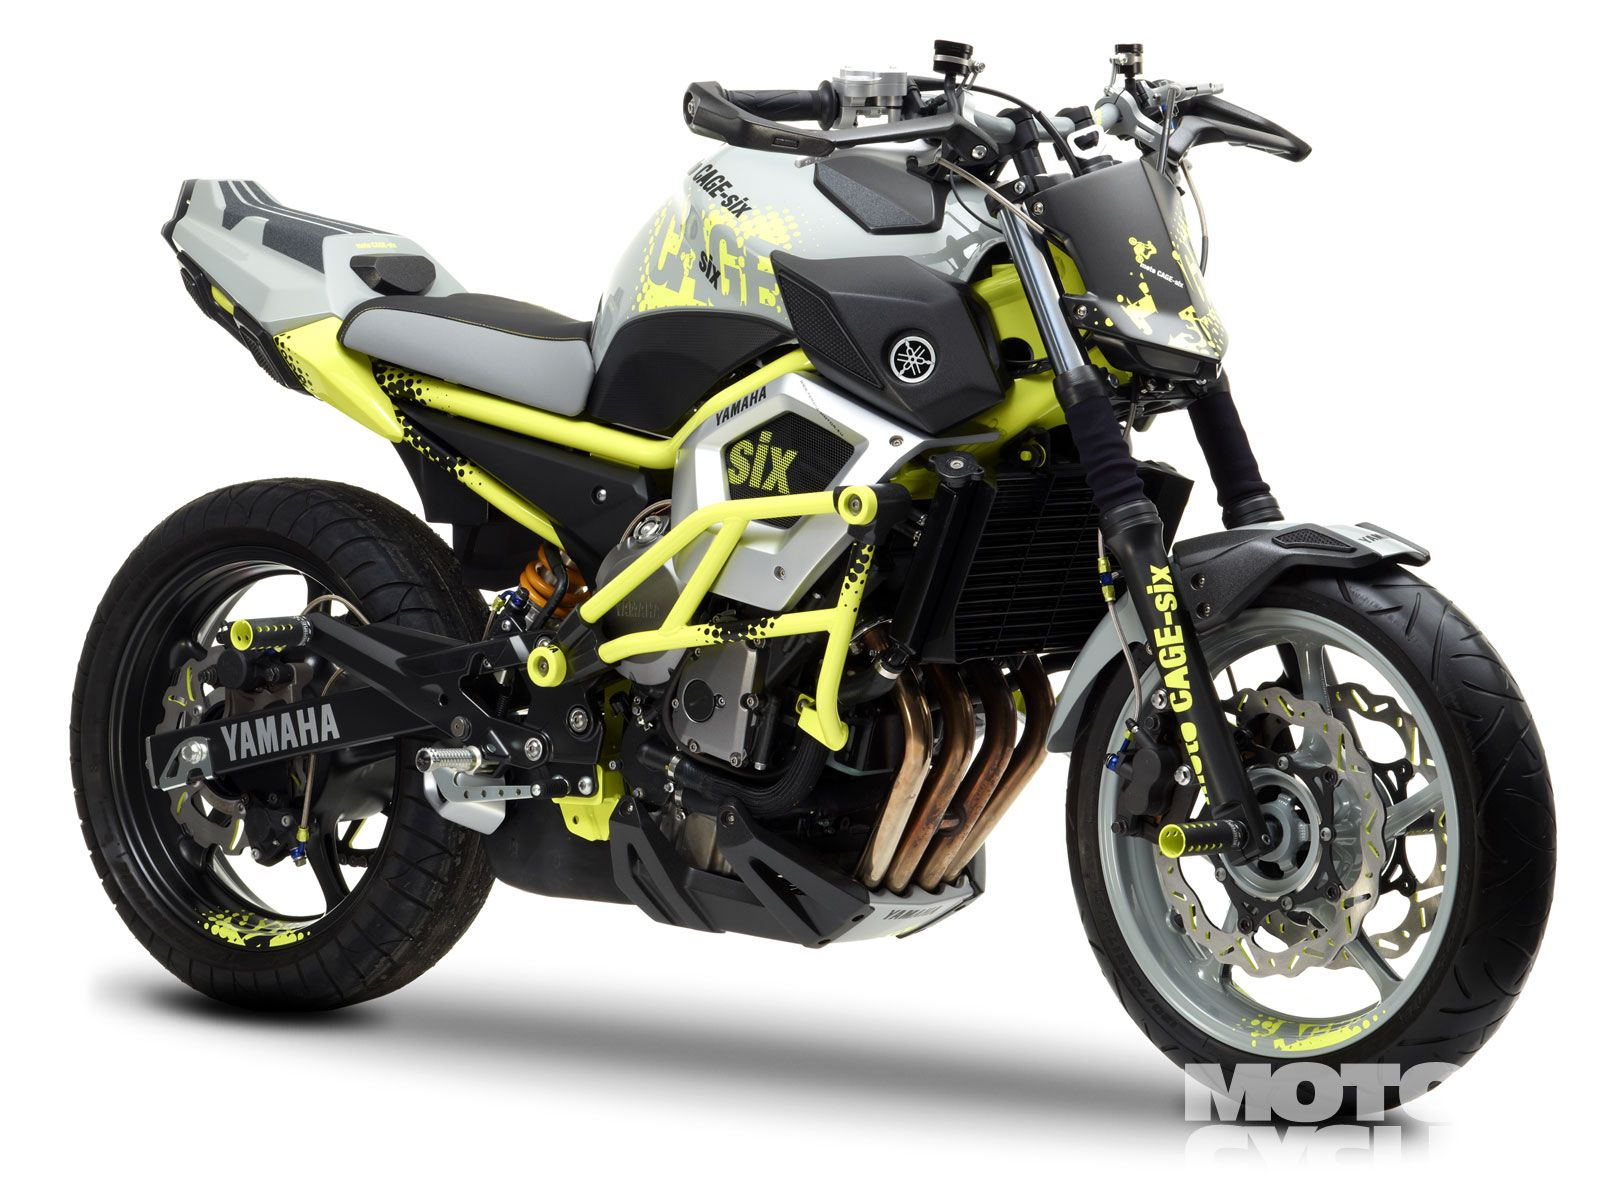 Google chrome themes yamaha - Yamaha Motorcycle Concepts Prototype Google Zoeken